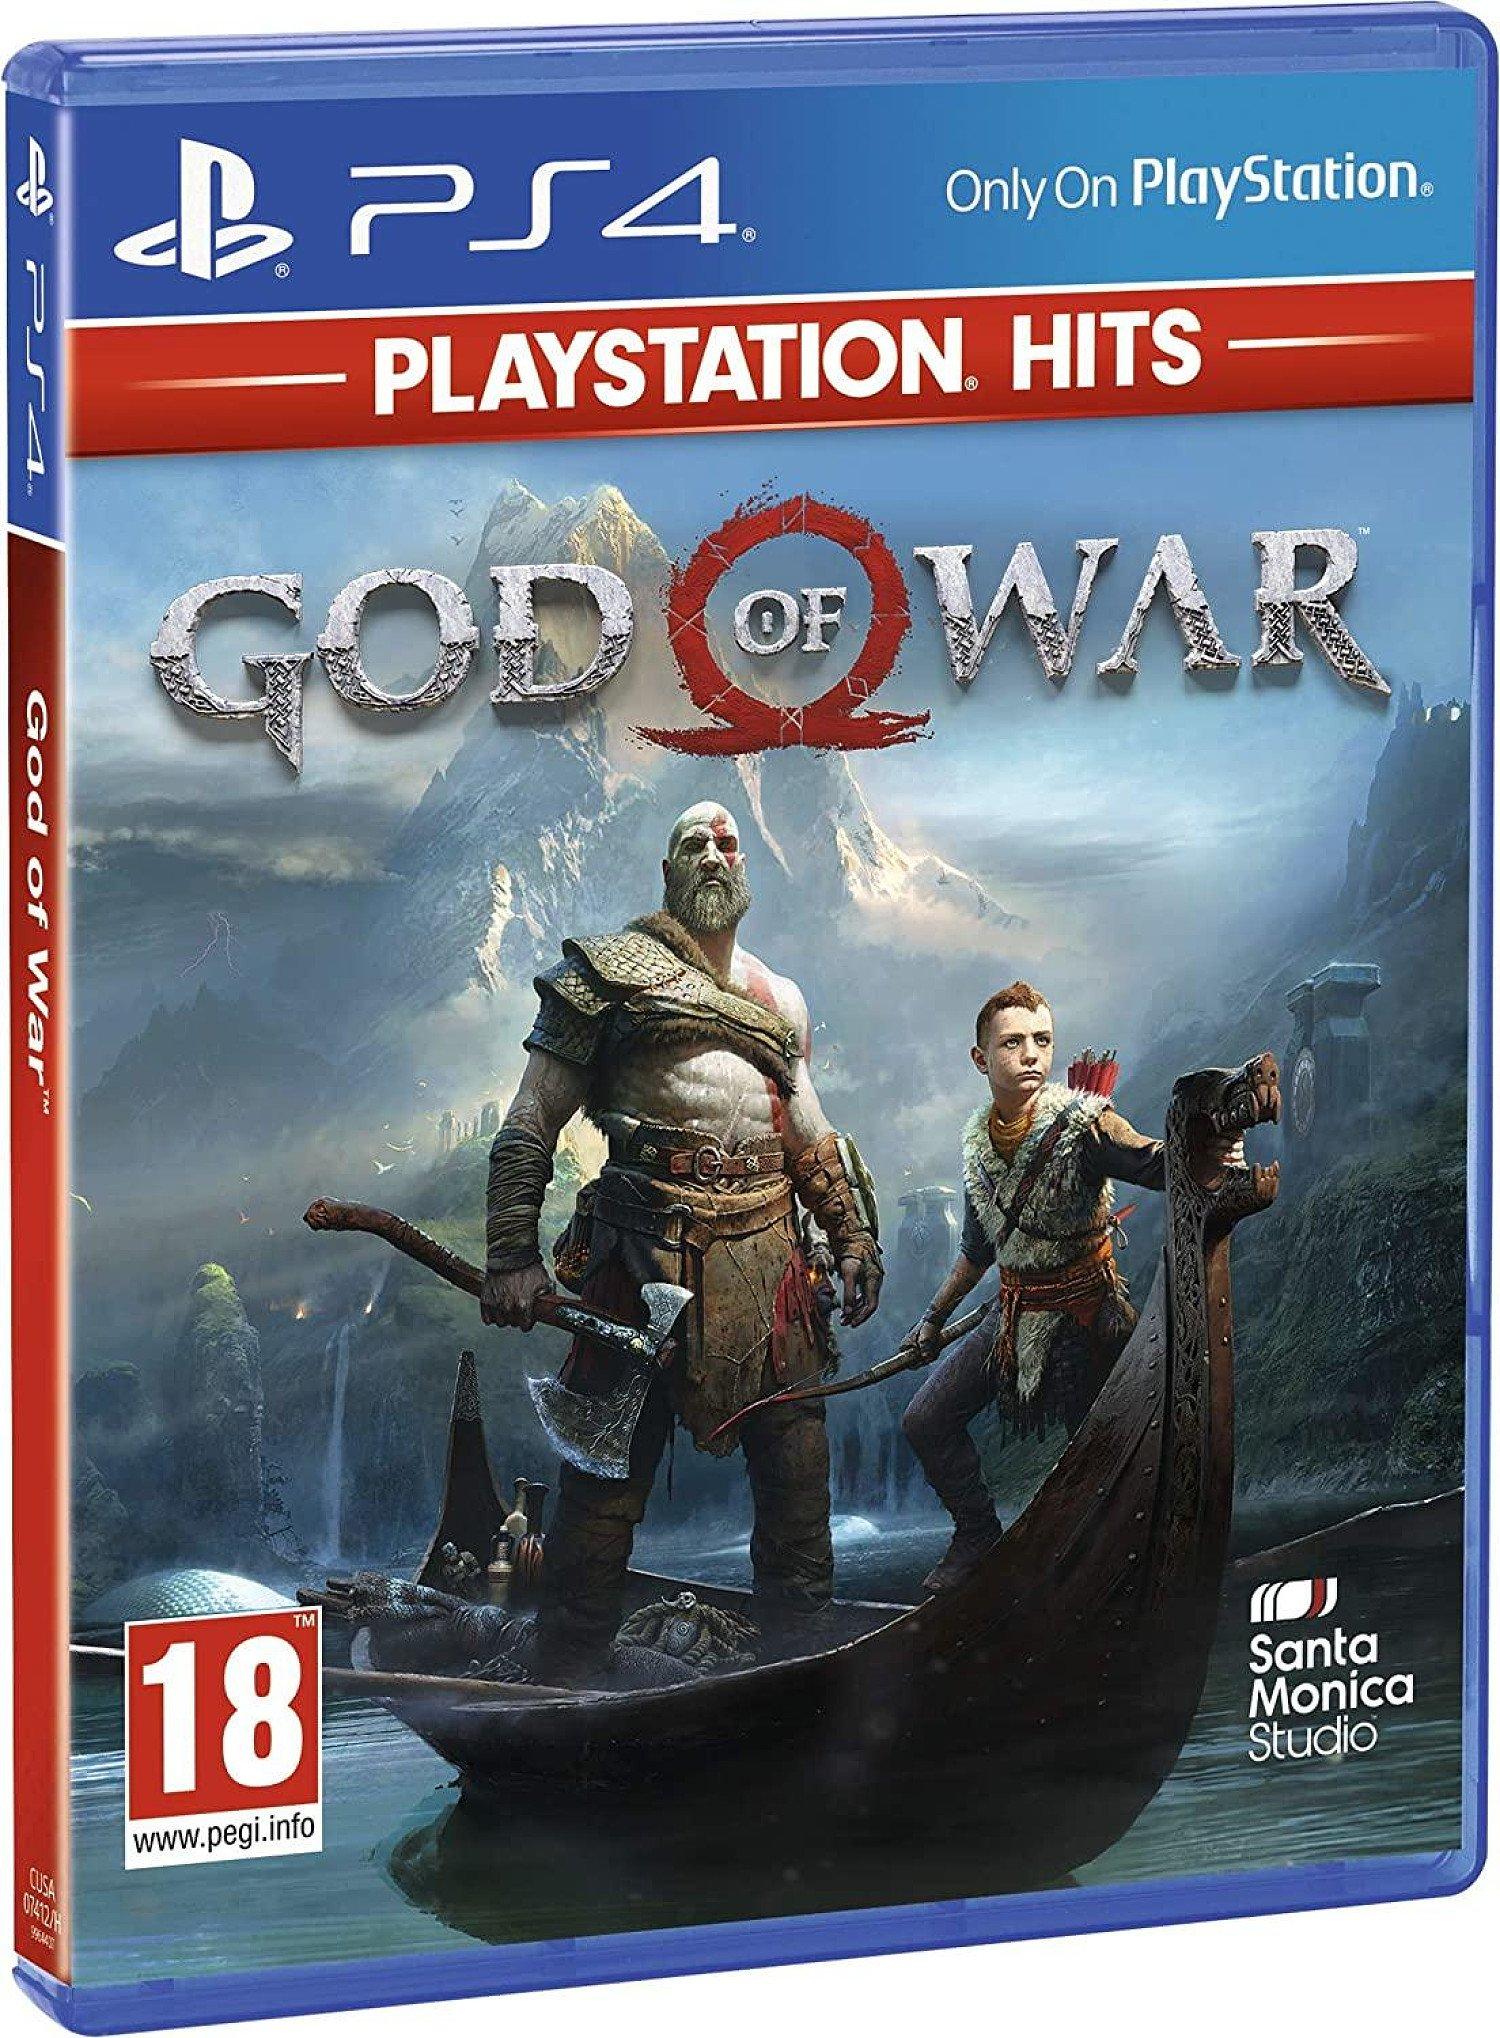 God Of War Playstation Hits (PS4) (BRAND NEW)